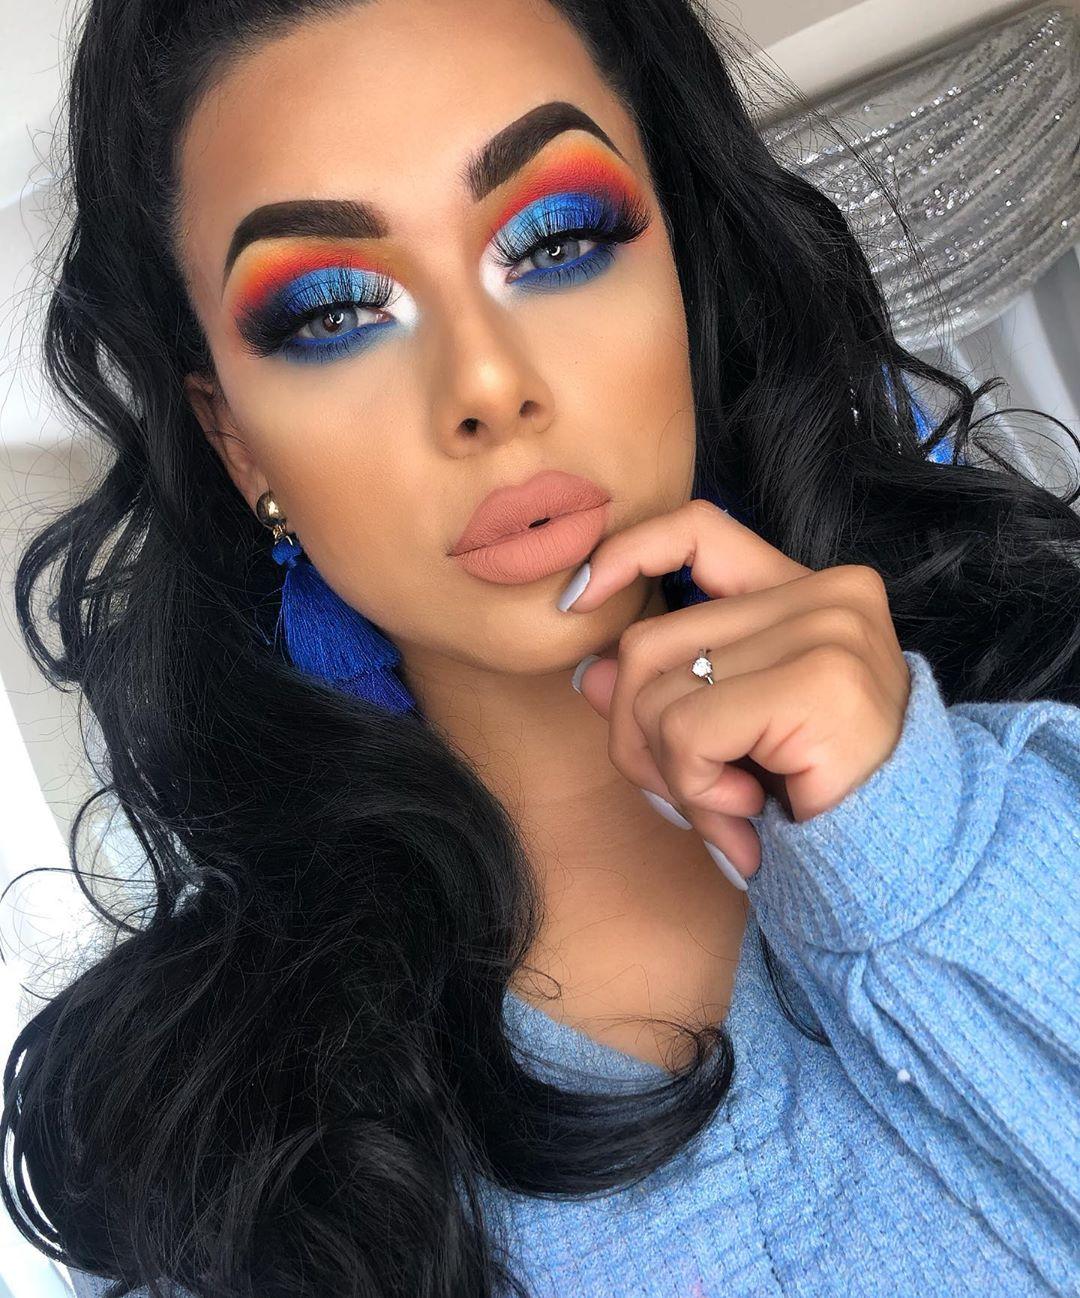 Maquiagem sombra azul